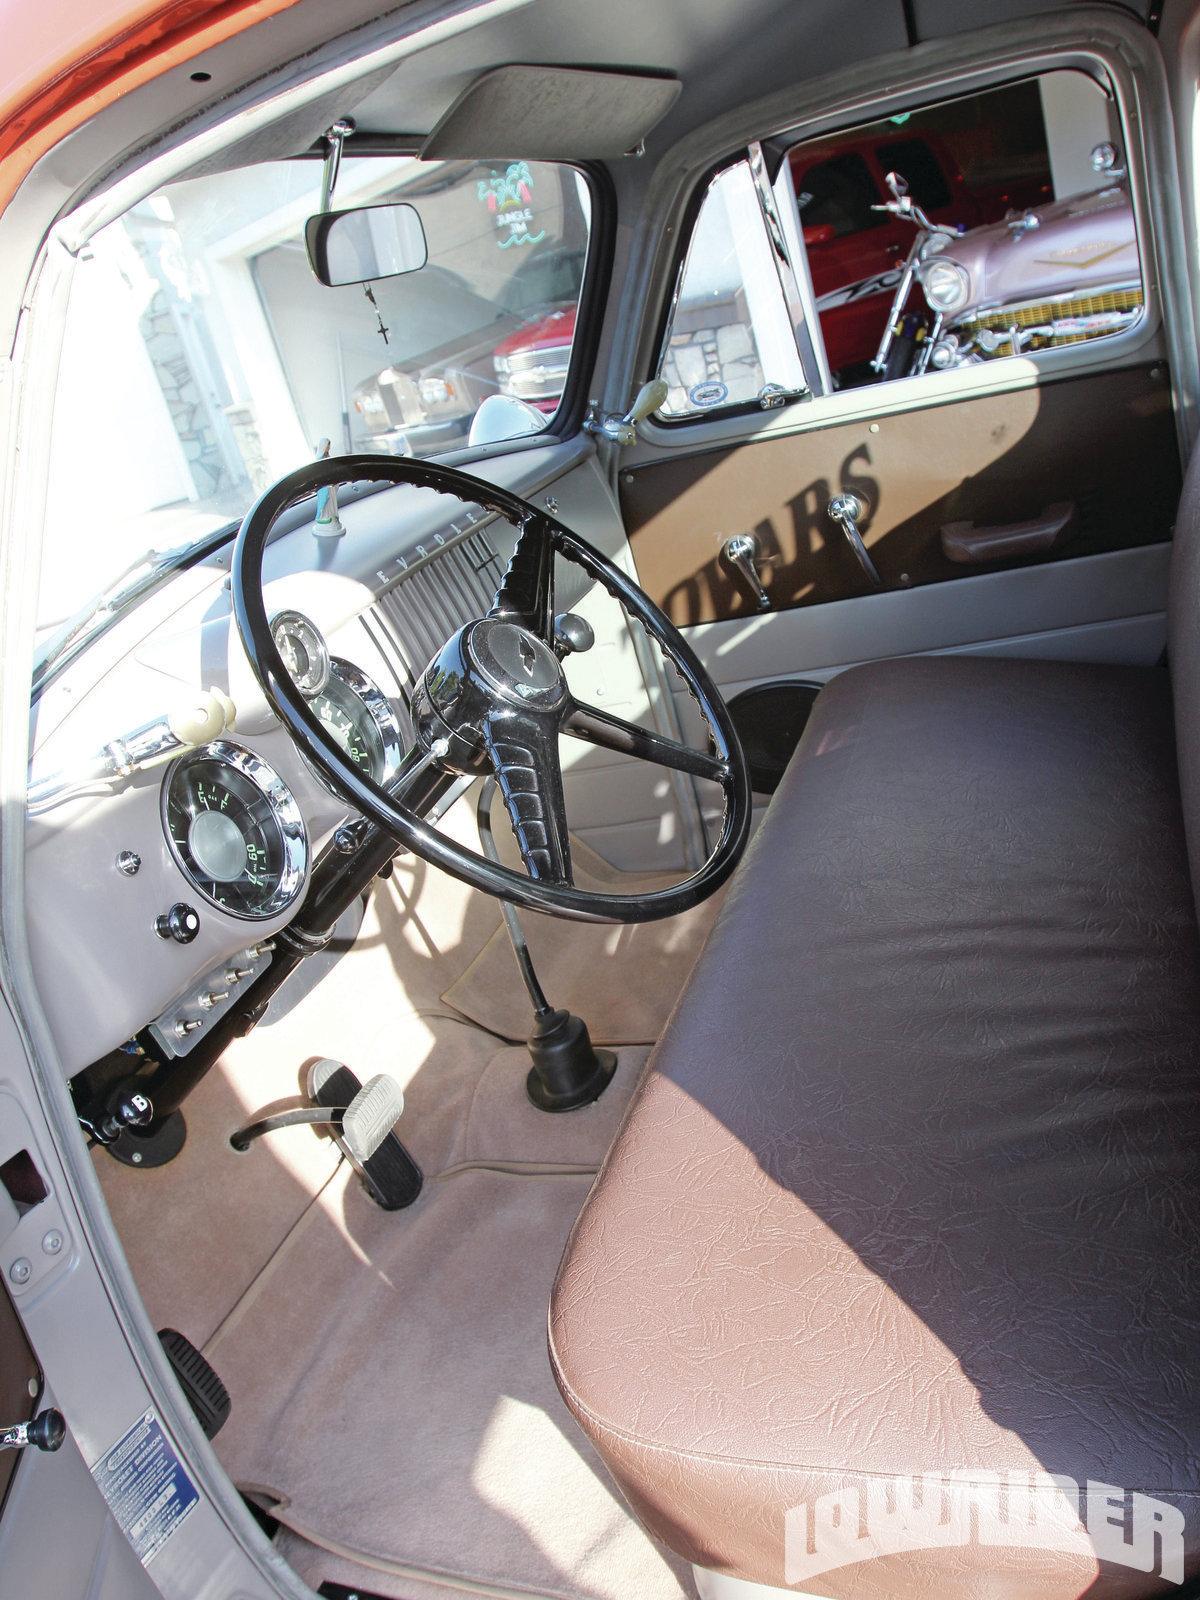 Chevrolet Interior on 235 Chevy Engine Specs